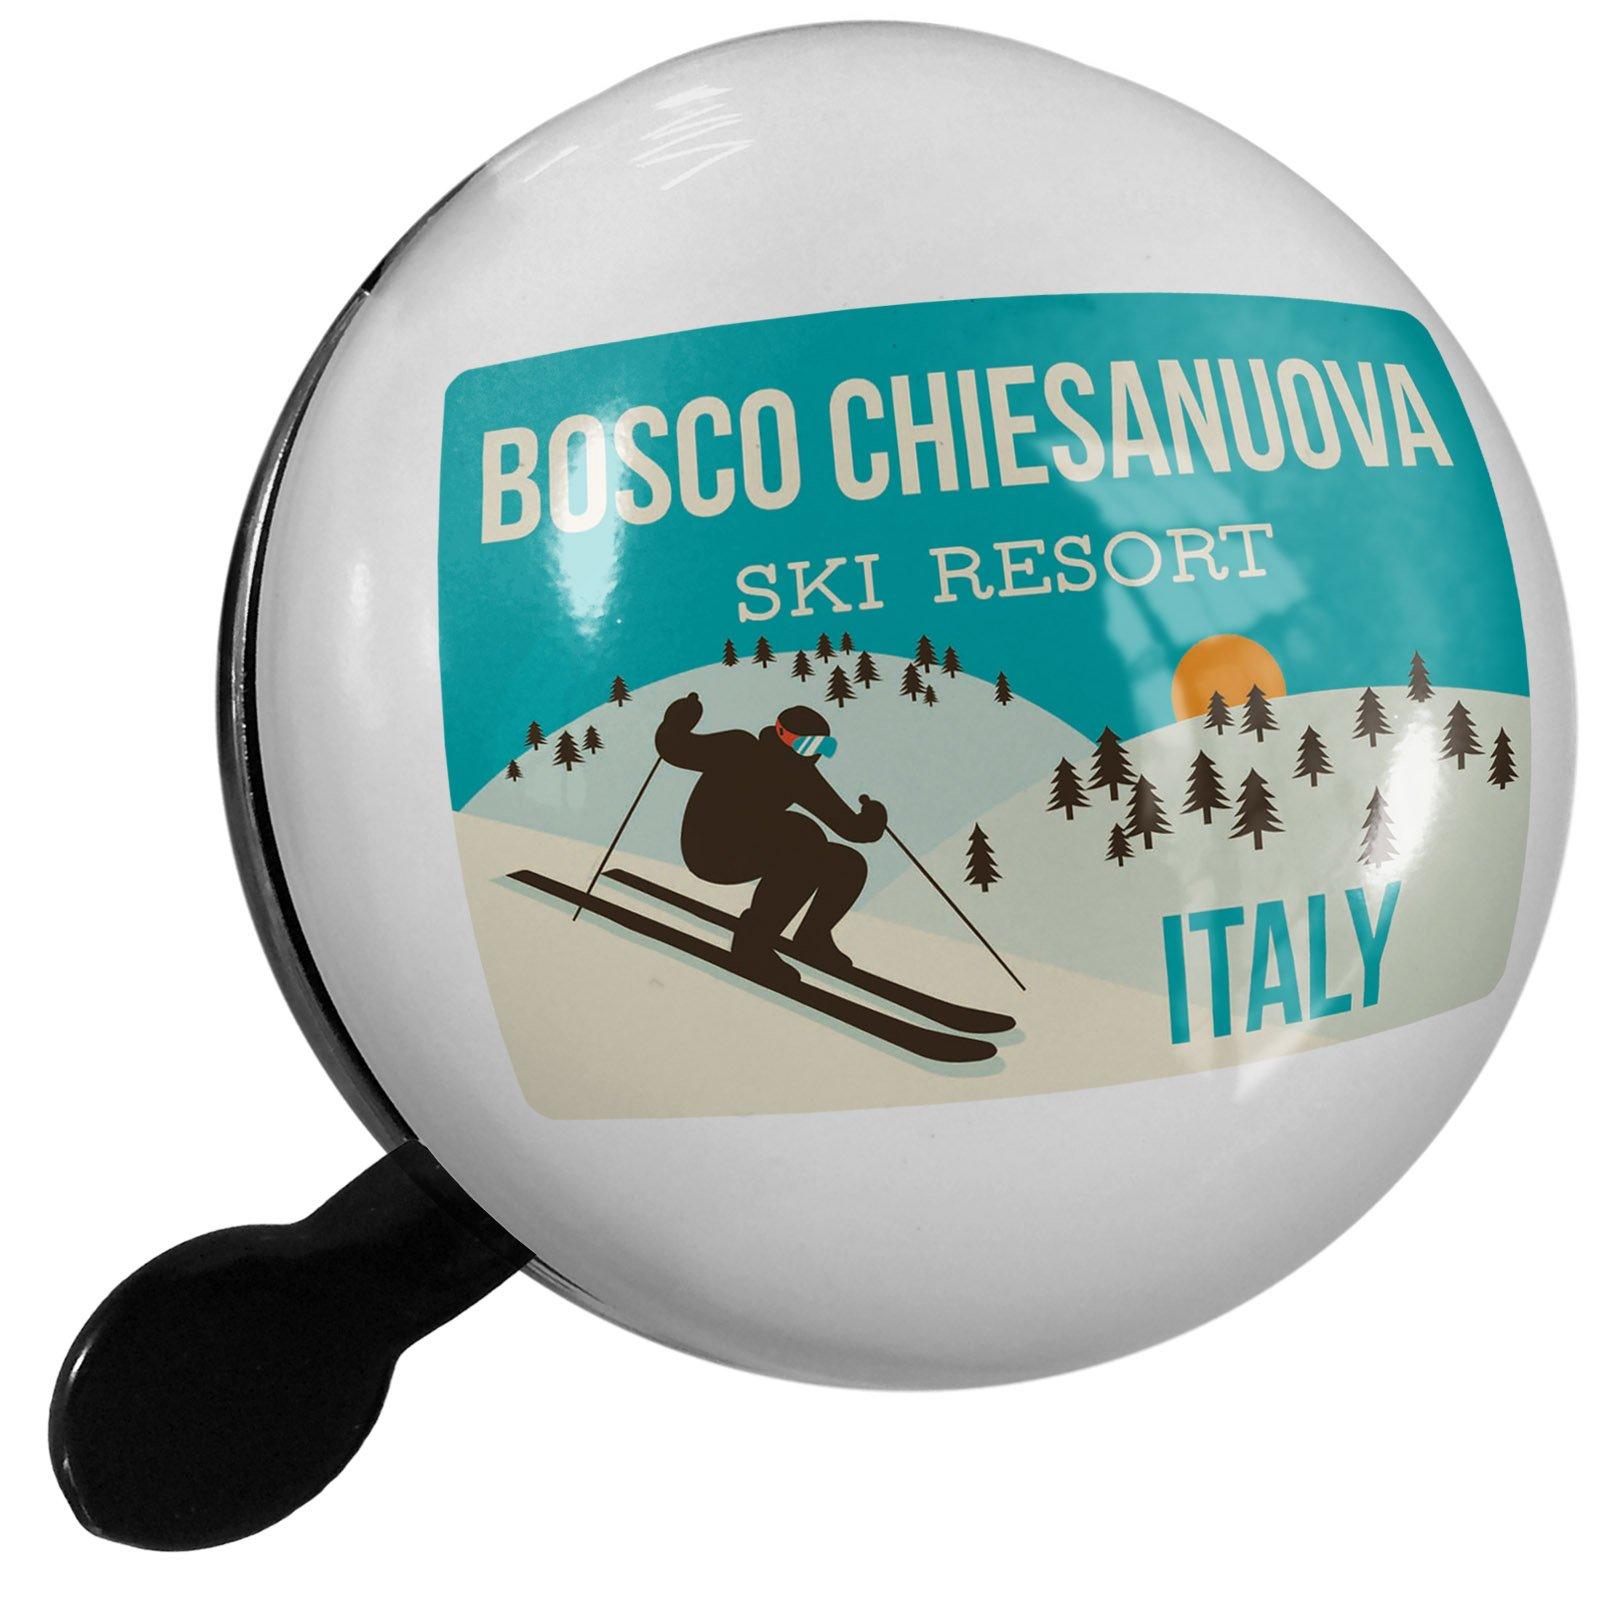 Small Bike Bell Bosco Chiesanuova Ski Resort - Italy Ski Resort - NEONBLOND